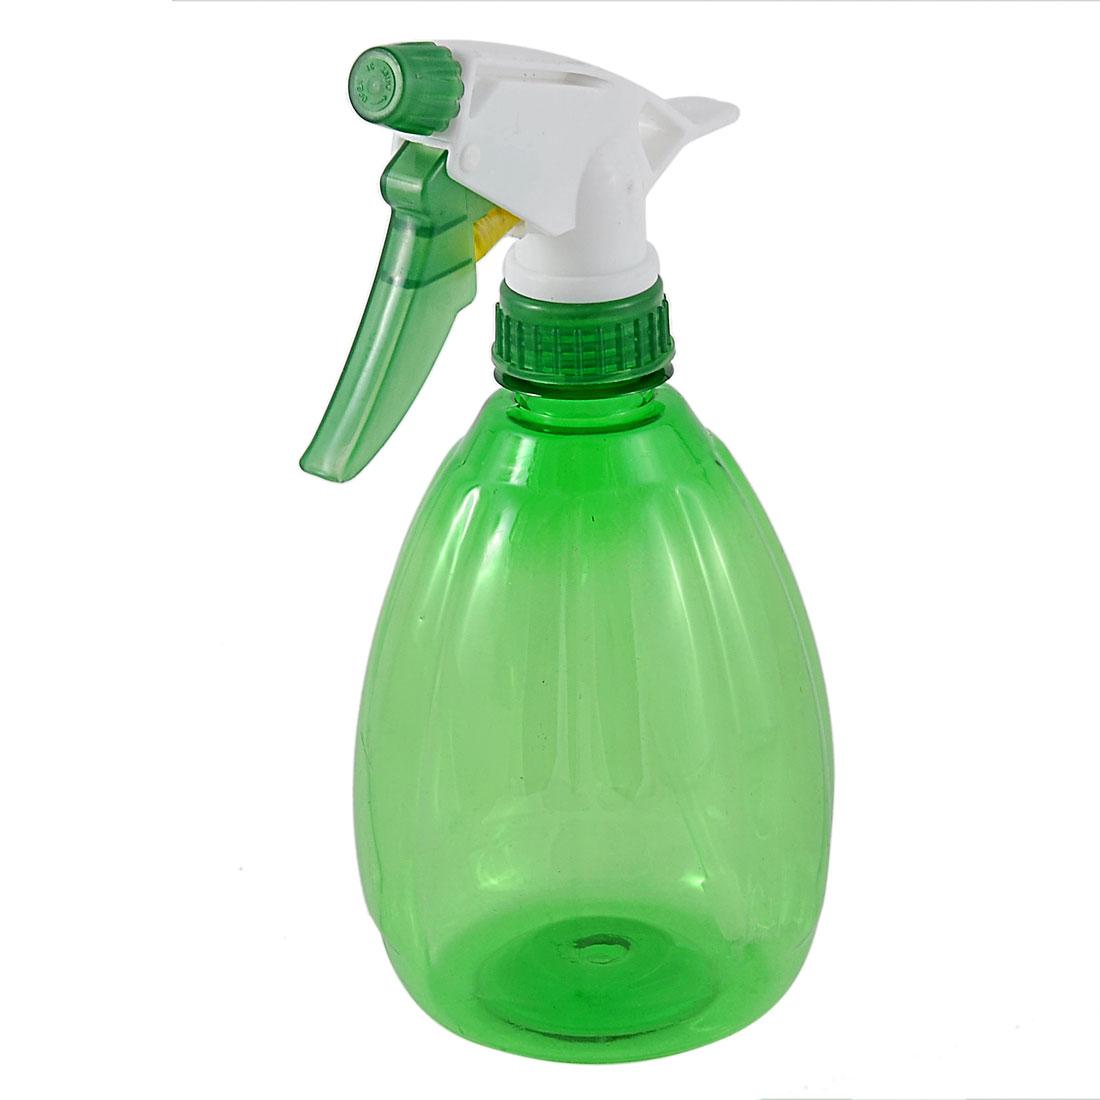 500ml 0.5L Hairdressing Watering Water Trigger Sprayer Spray Bottle Green